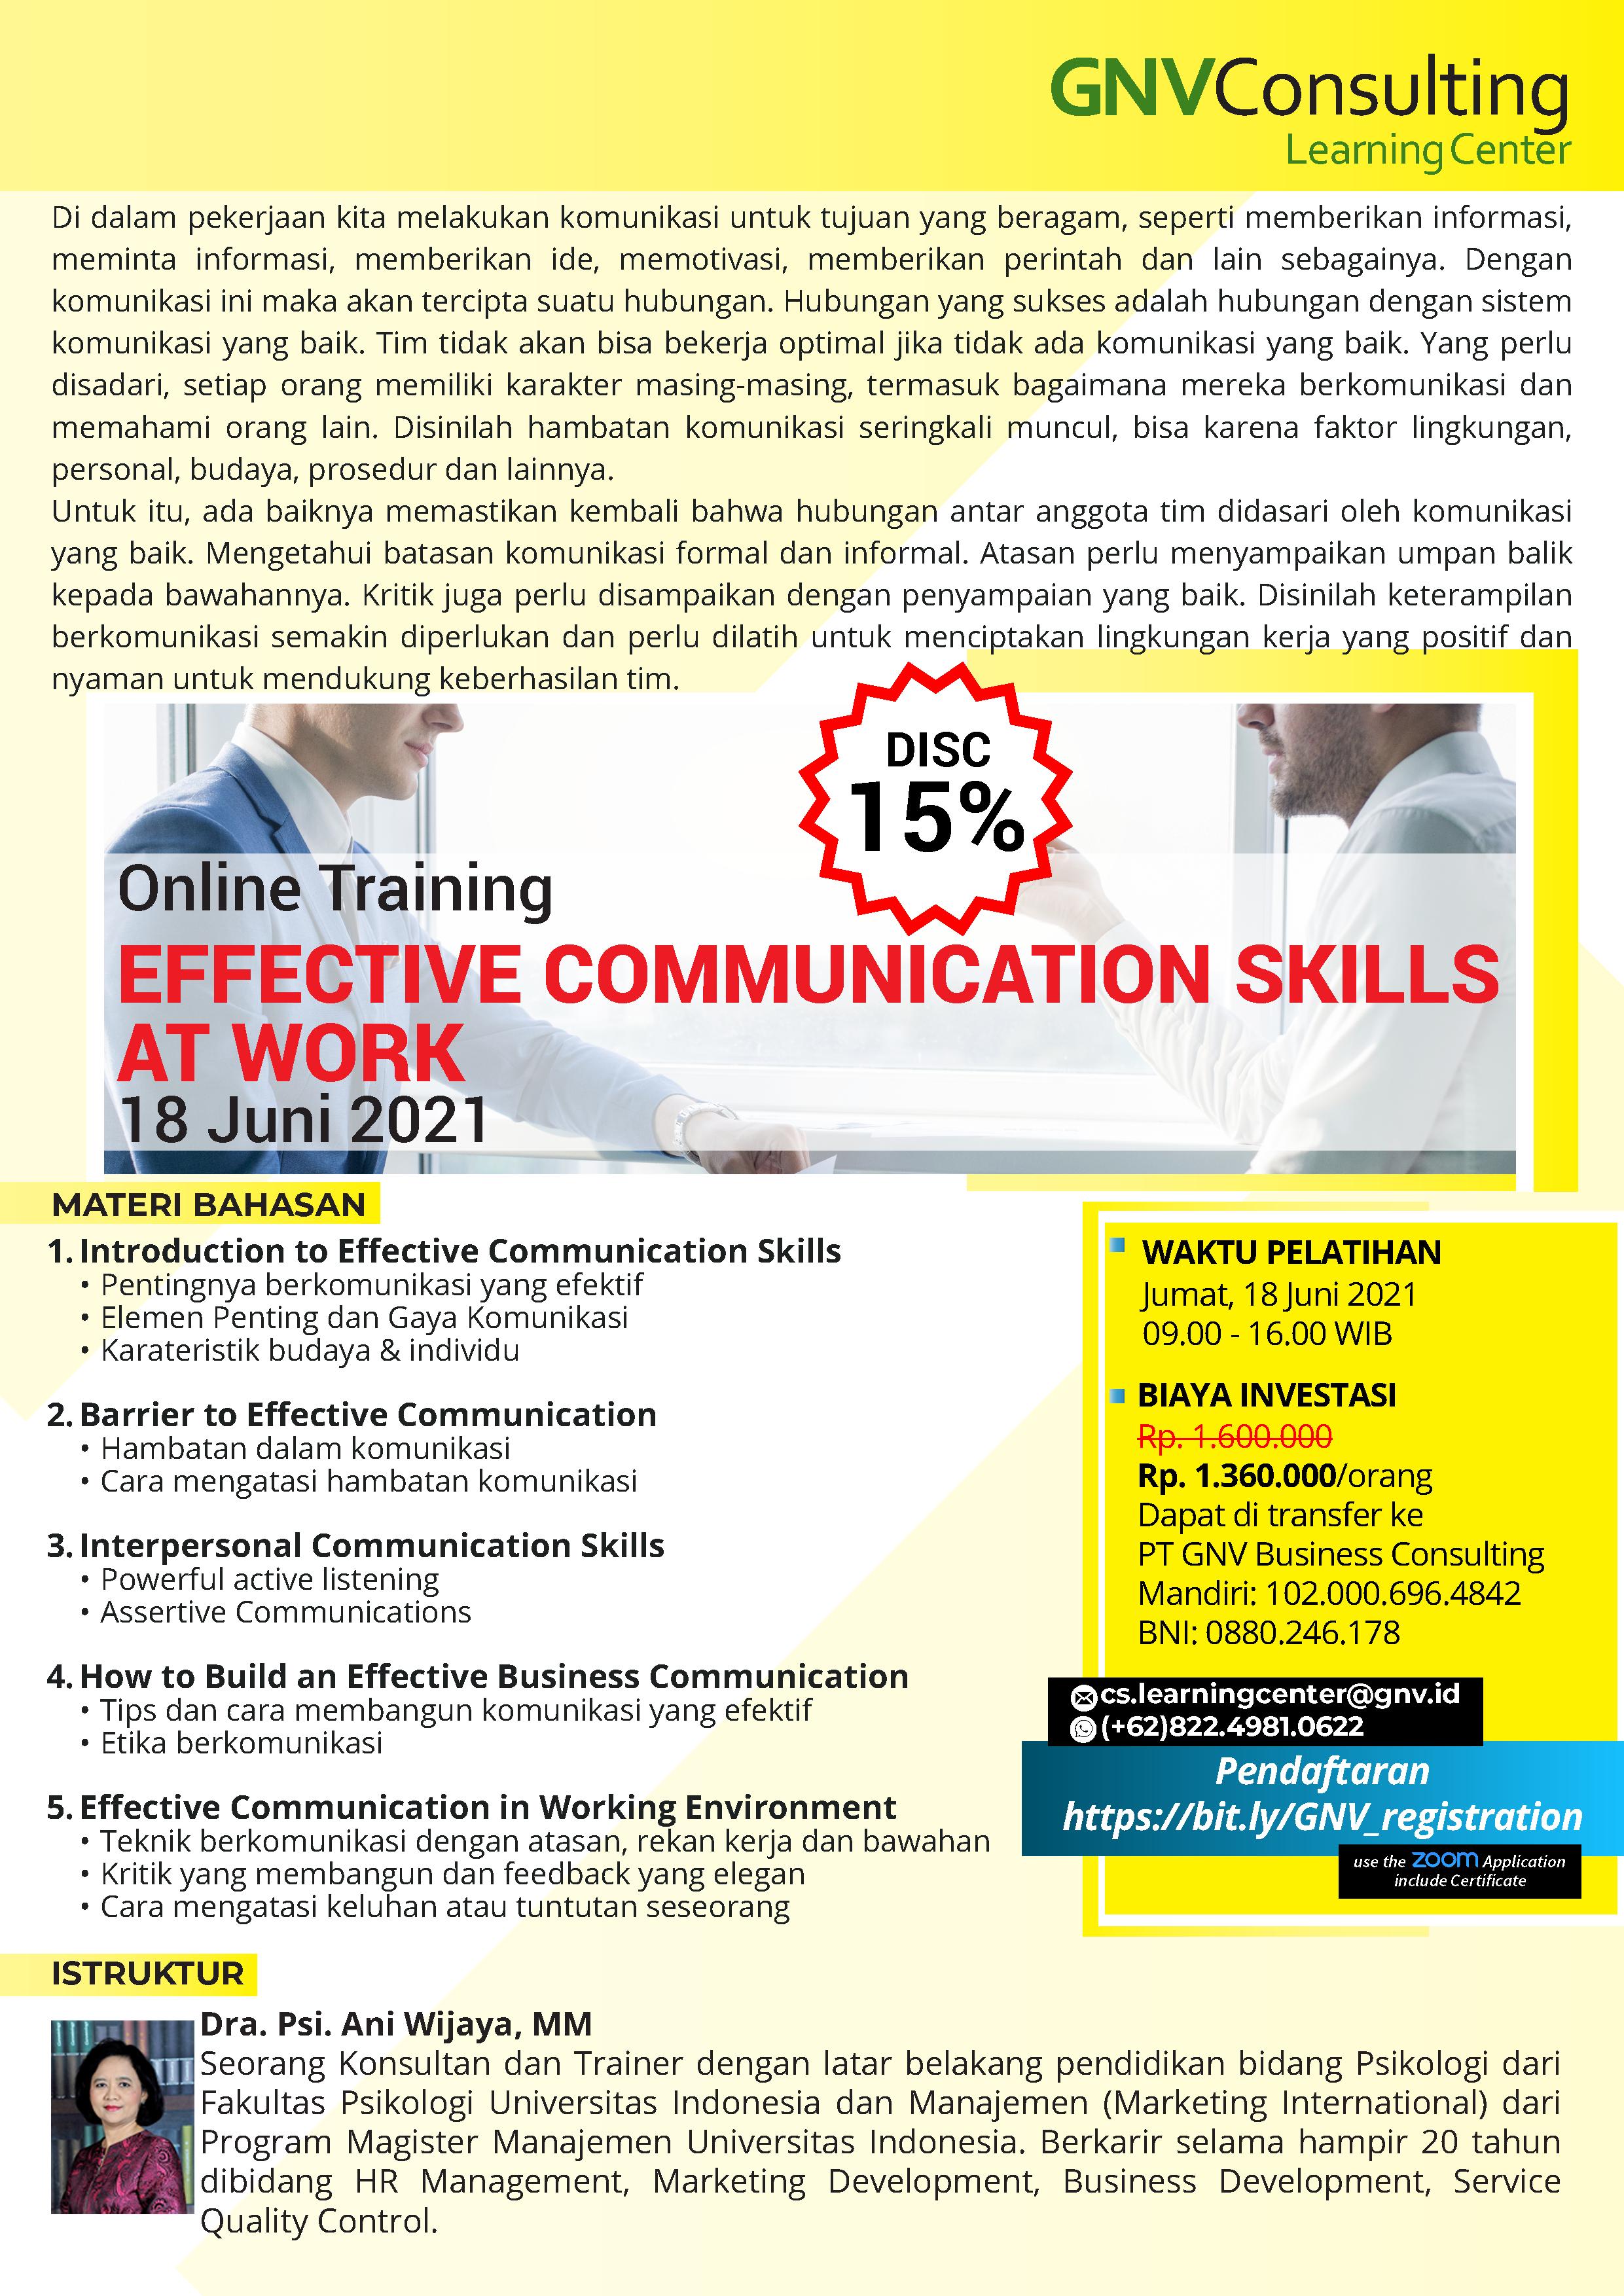 Effective Communication Skills at Work – Online Training